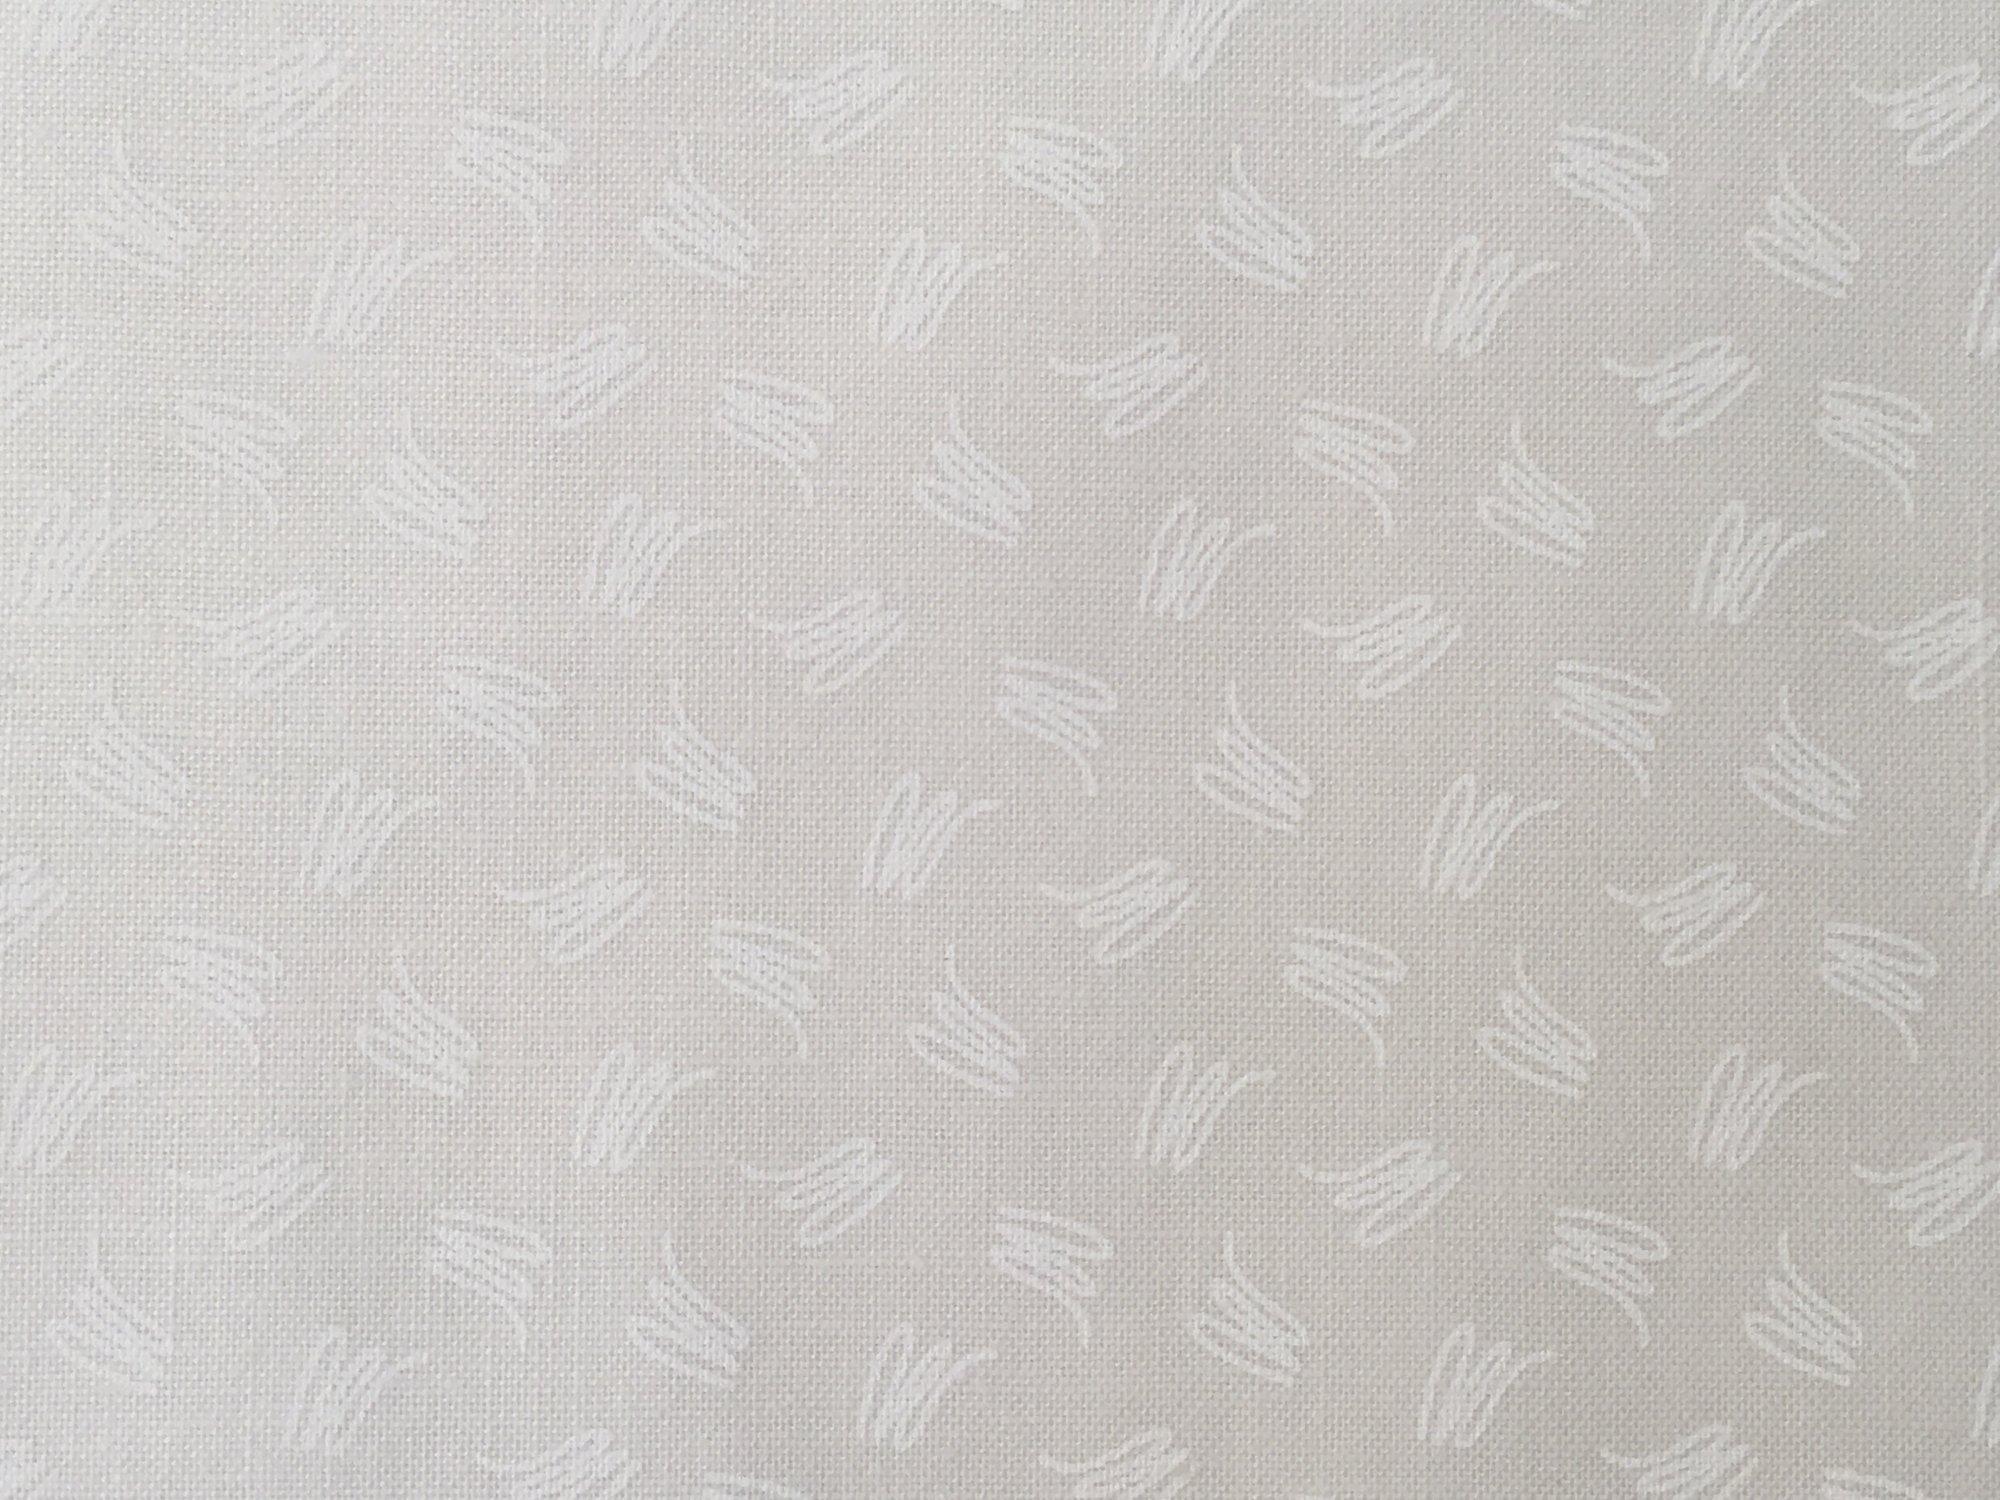 RAMBLINGS 11 WHITE SQUIGGLES ON NEUTRAL  RA110077901 P&B Textiles